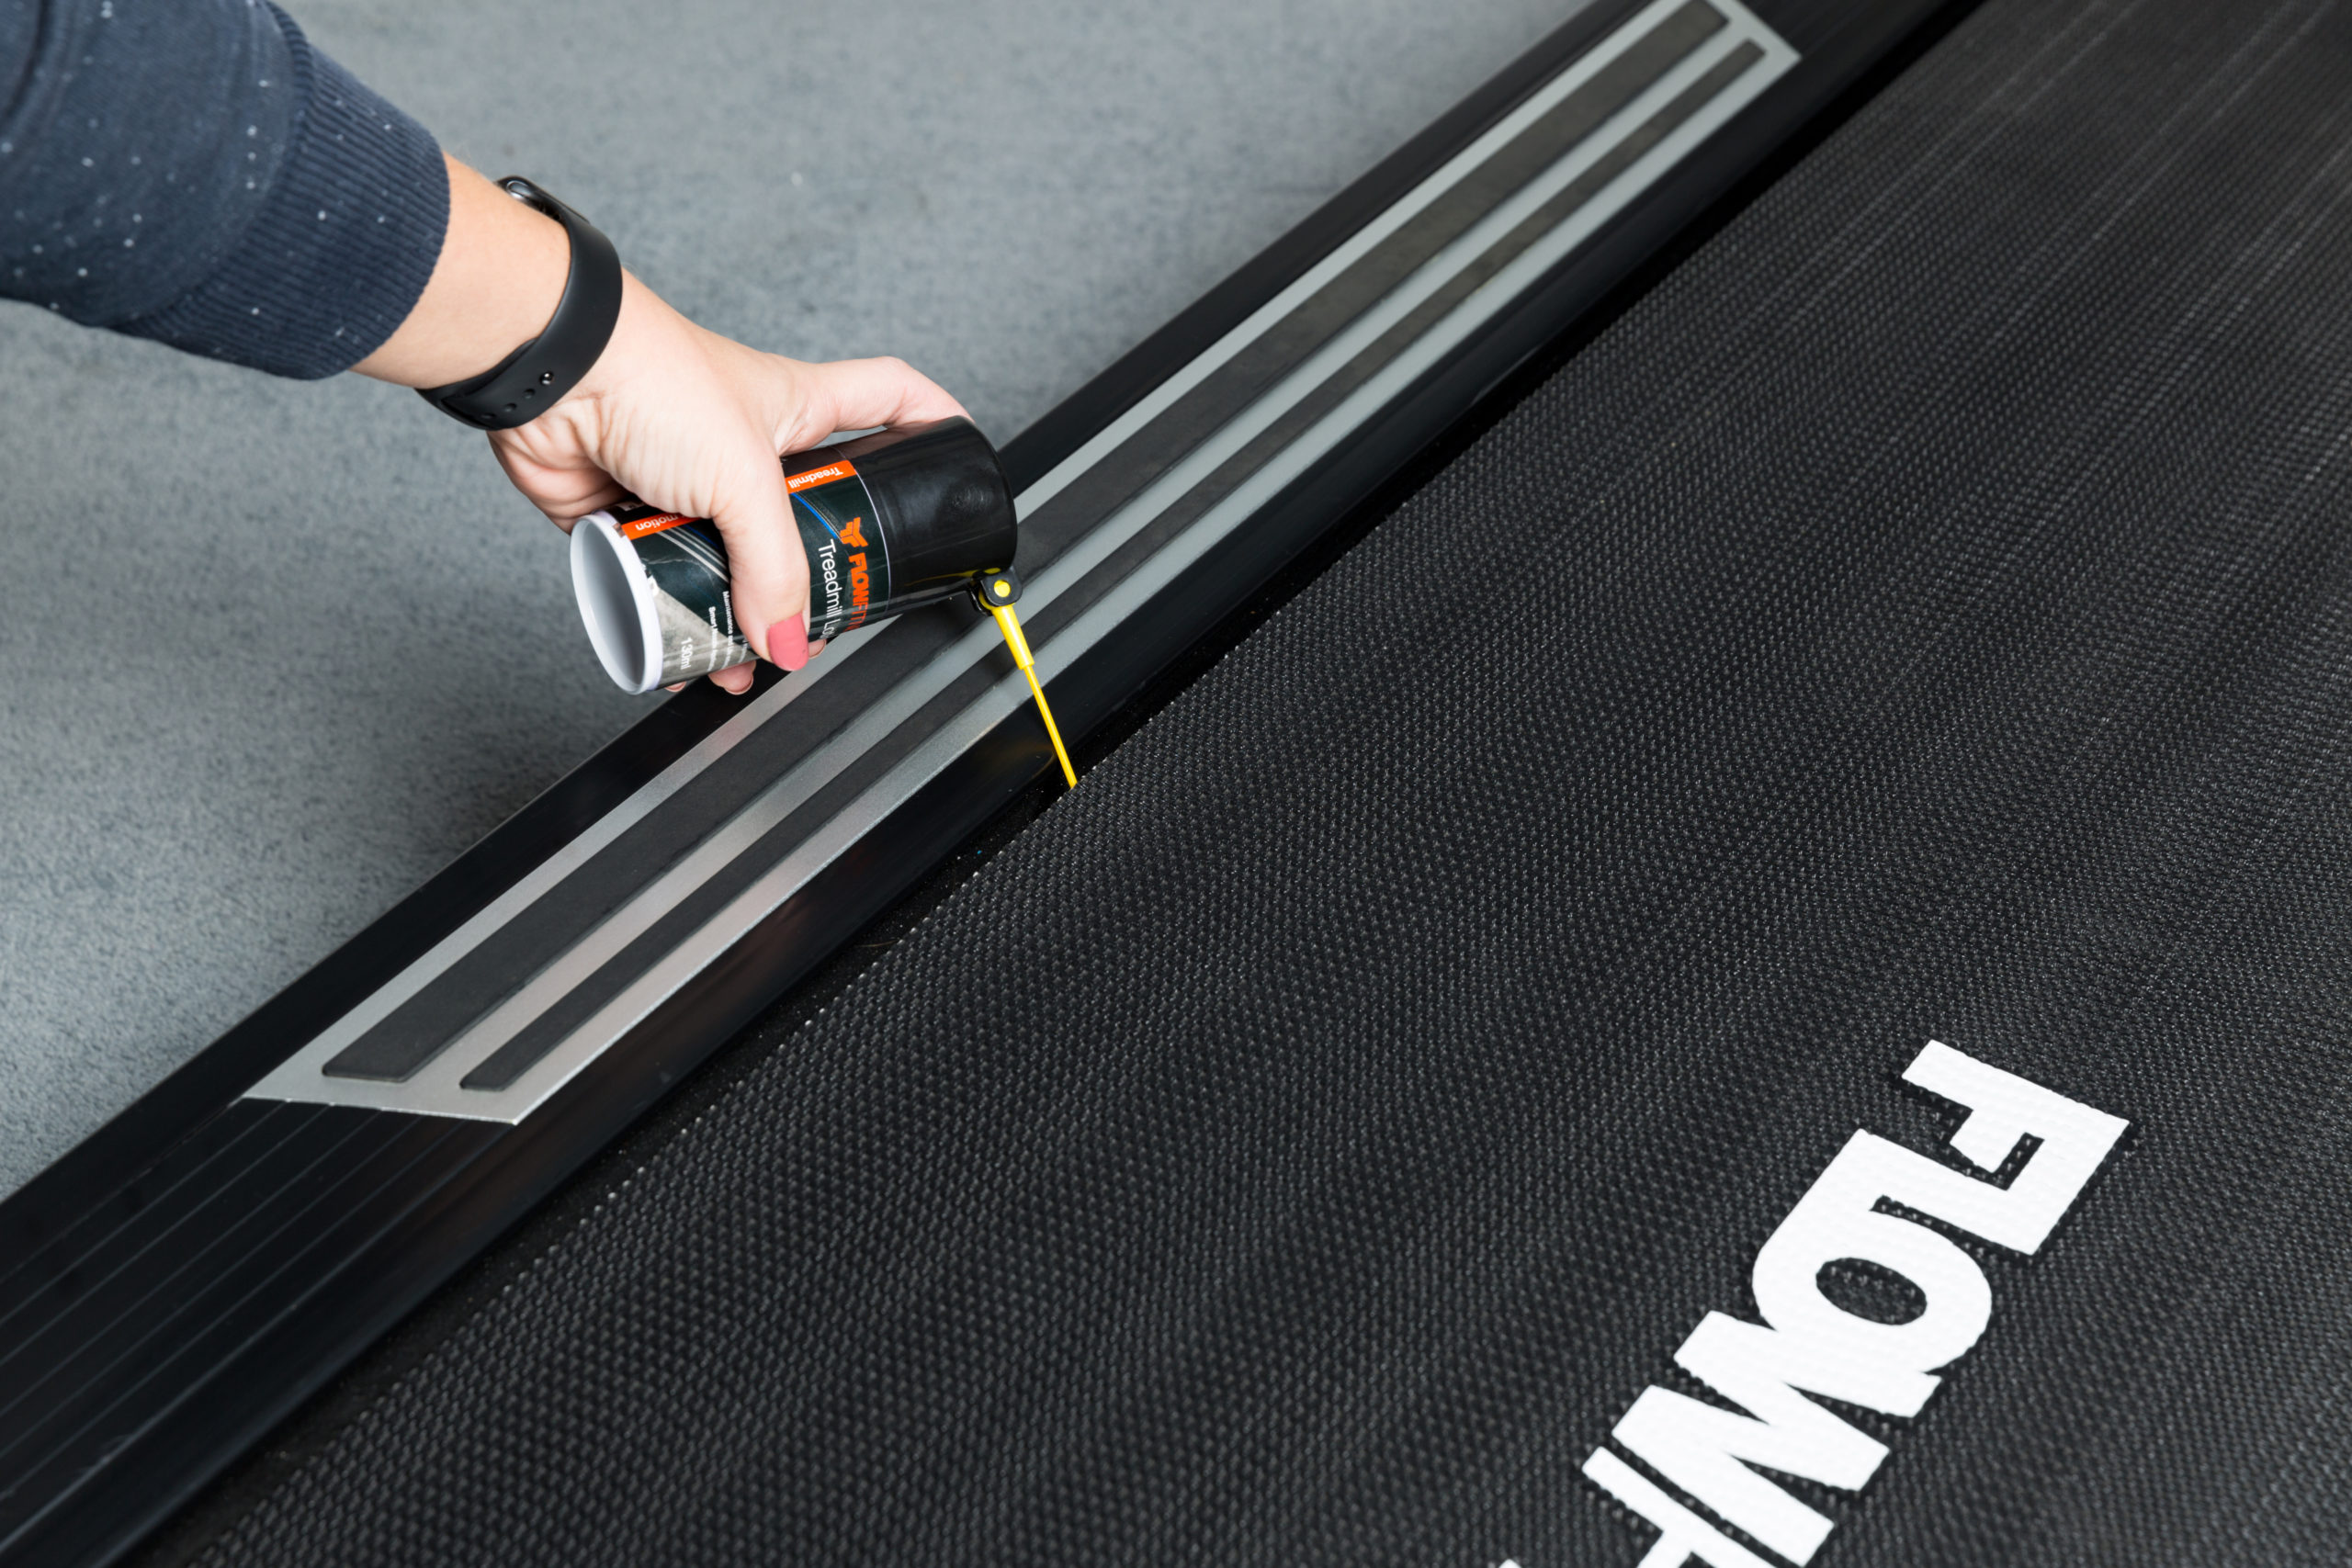 Flow Fitness Tabel Treadmill Lotion 130 ml 3